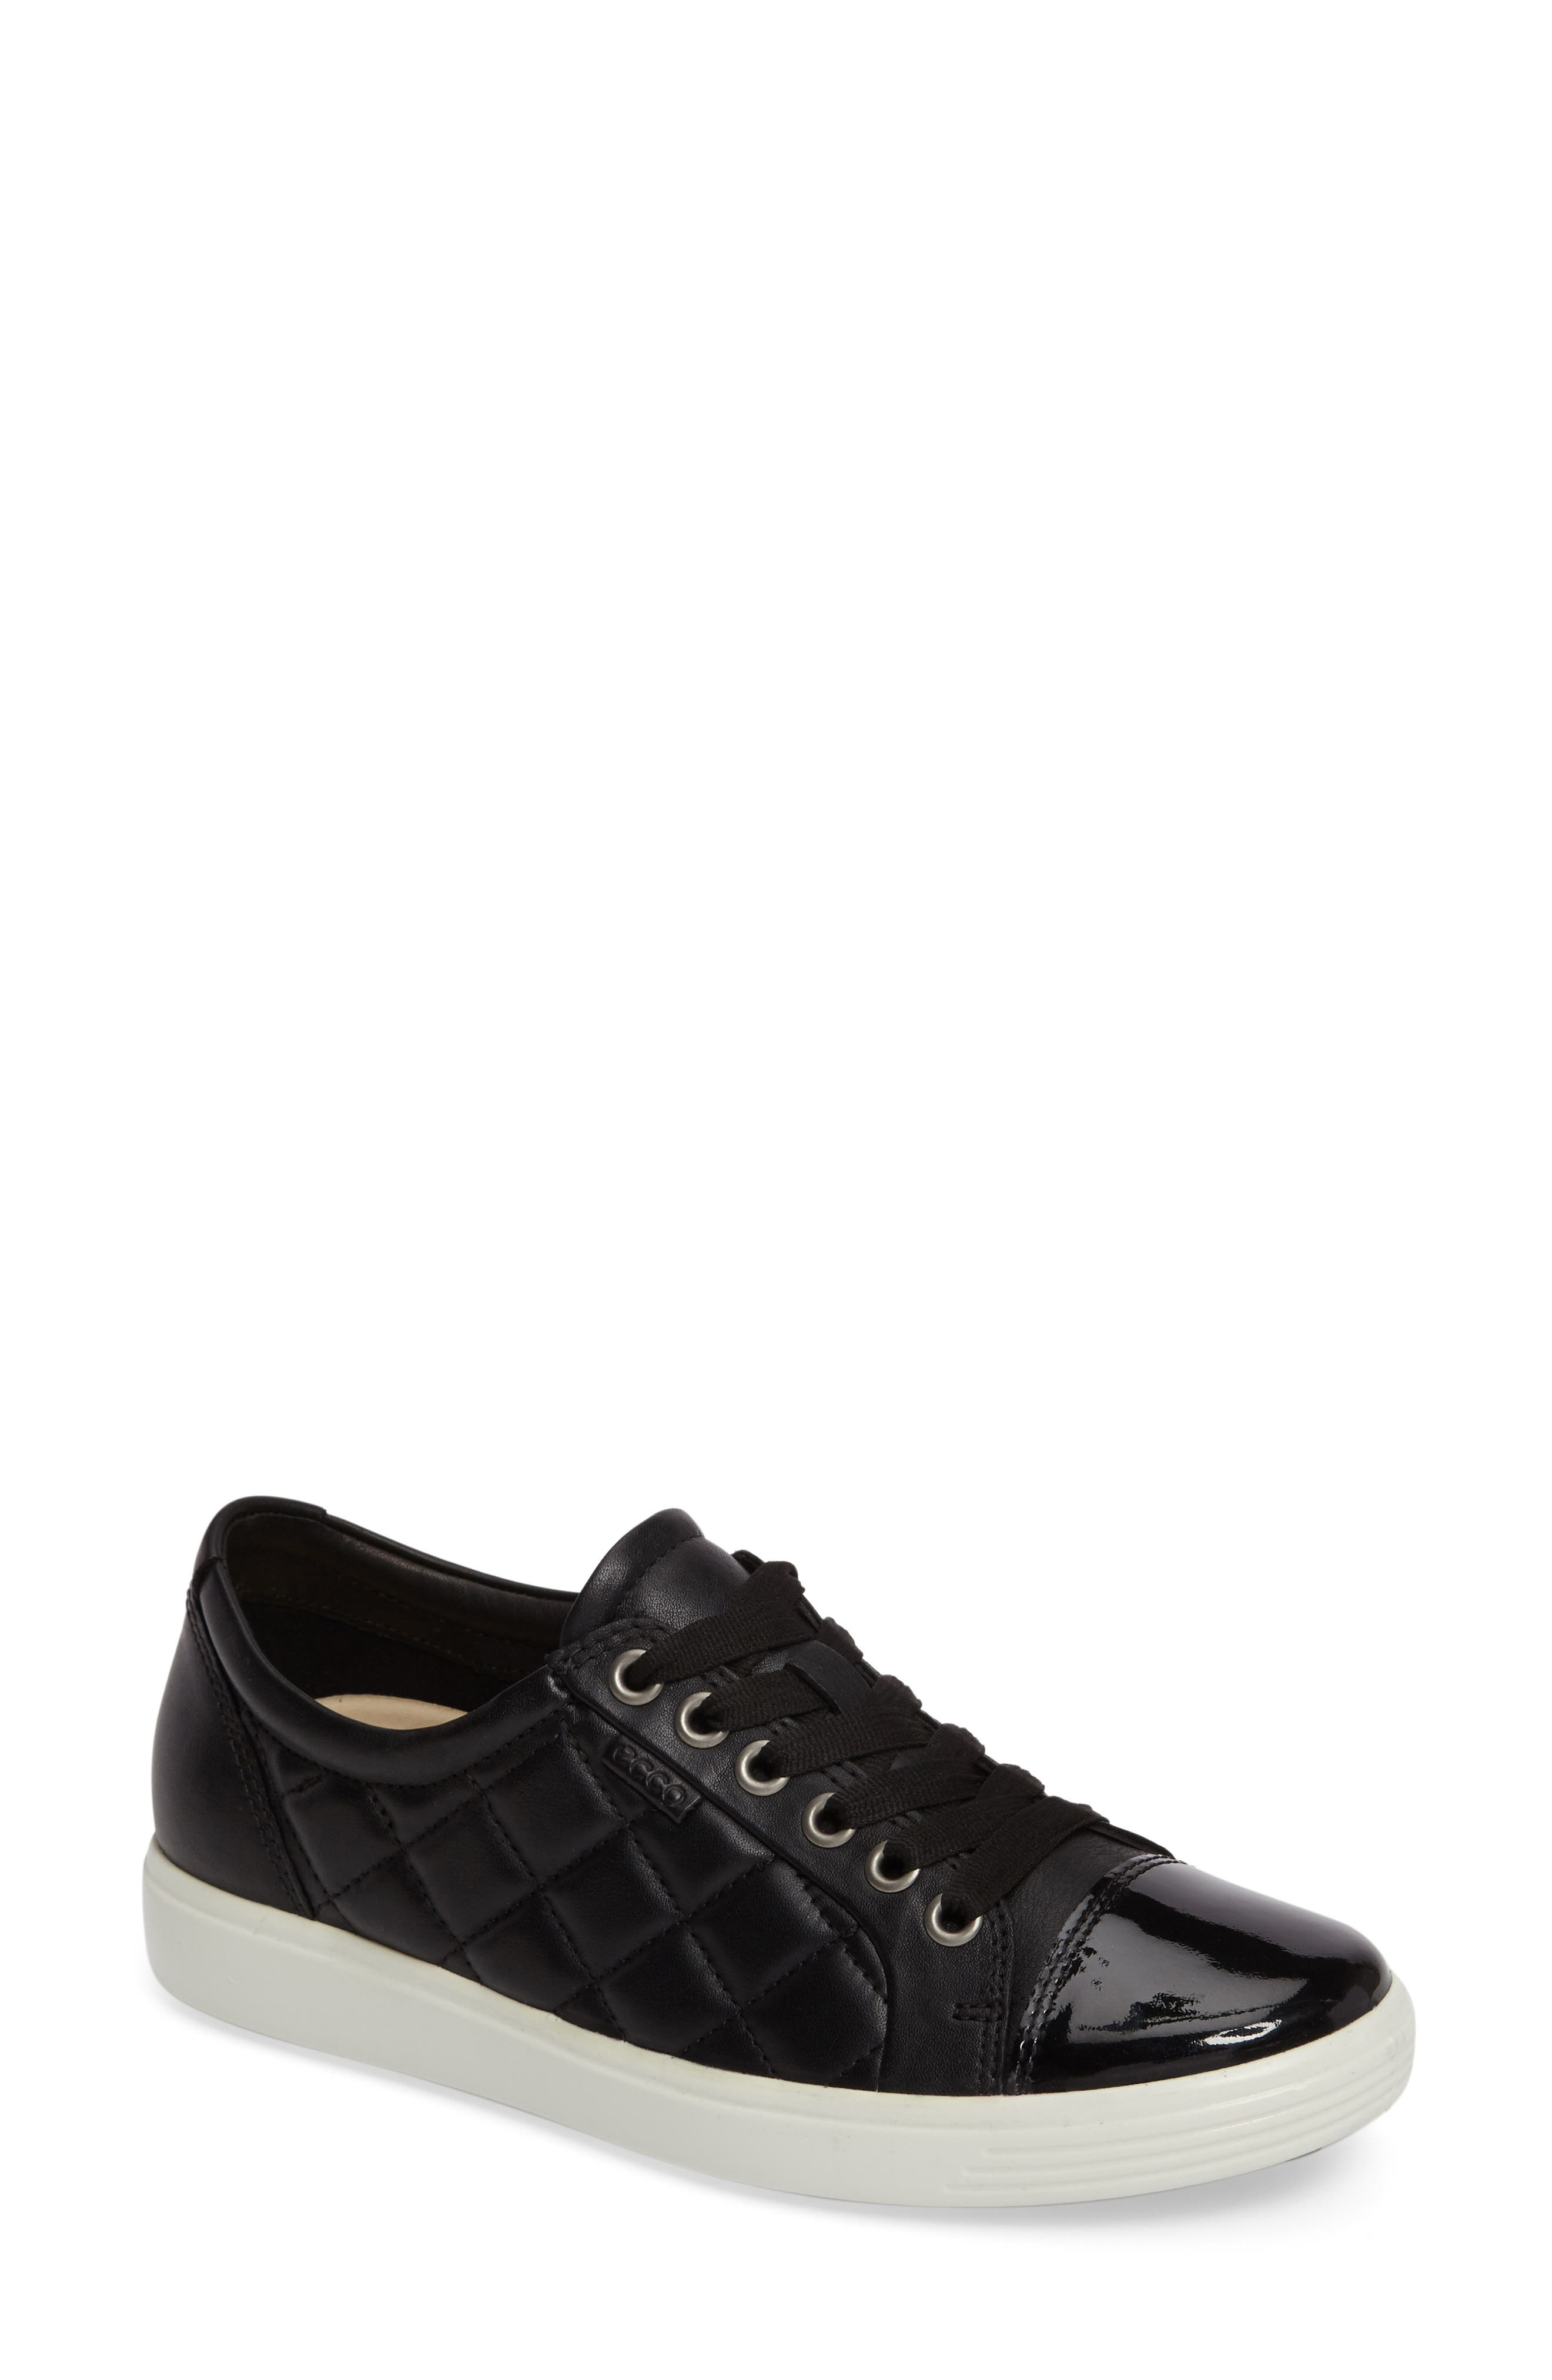 Main Image - ECCO 'Soft 7' Sneaker (Women)